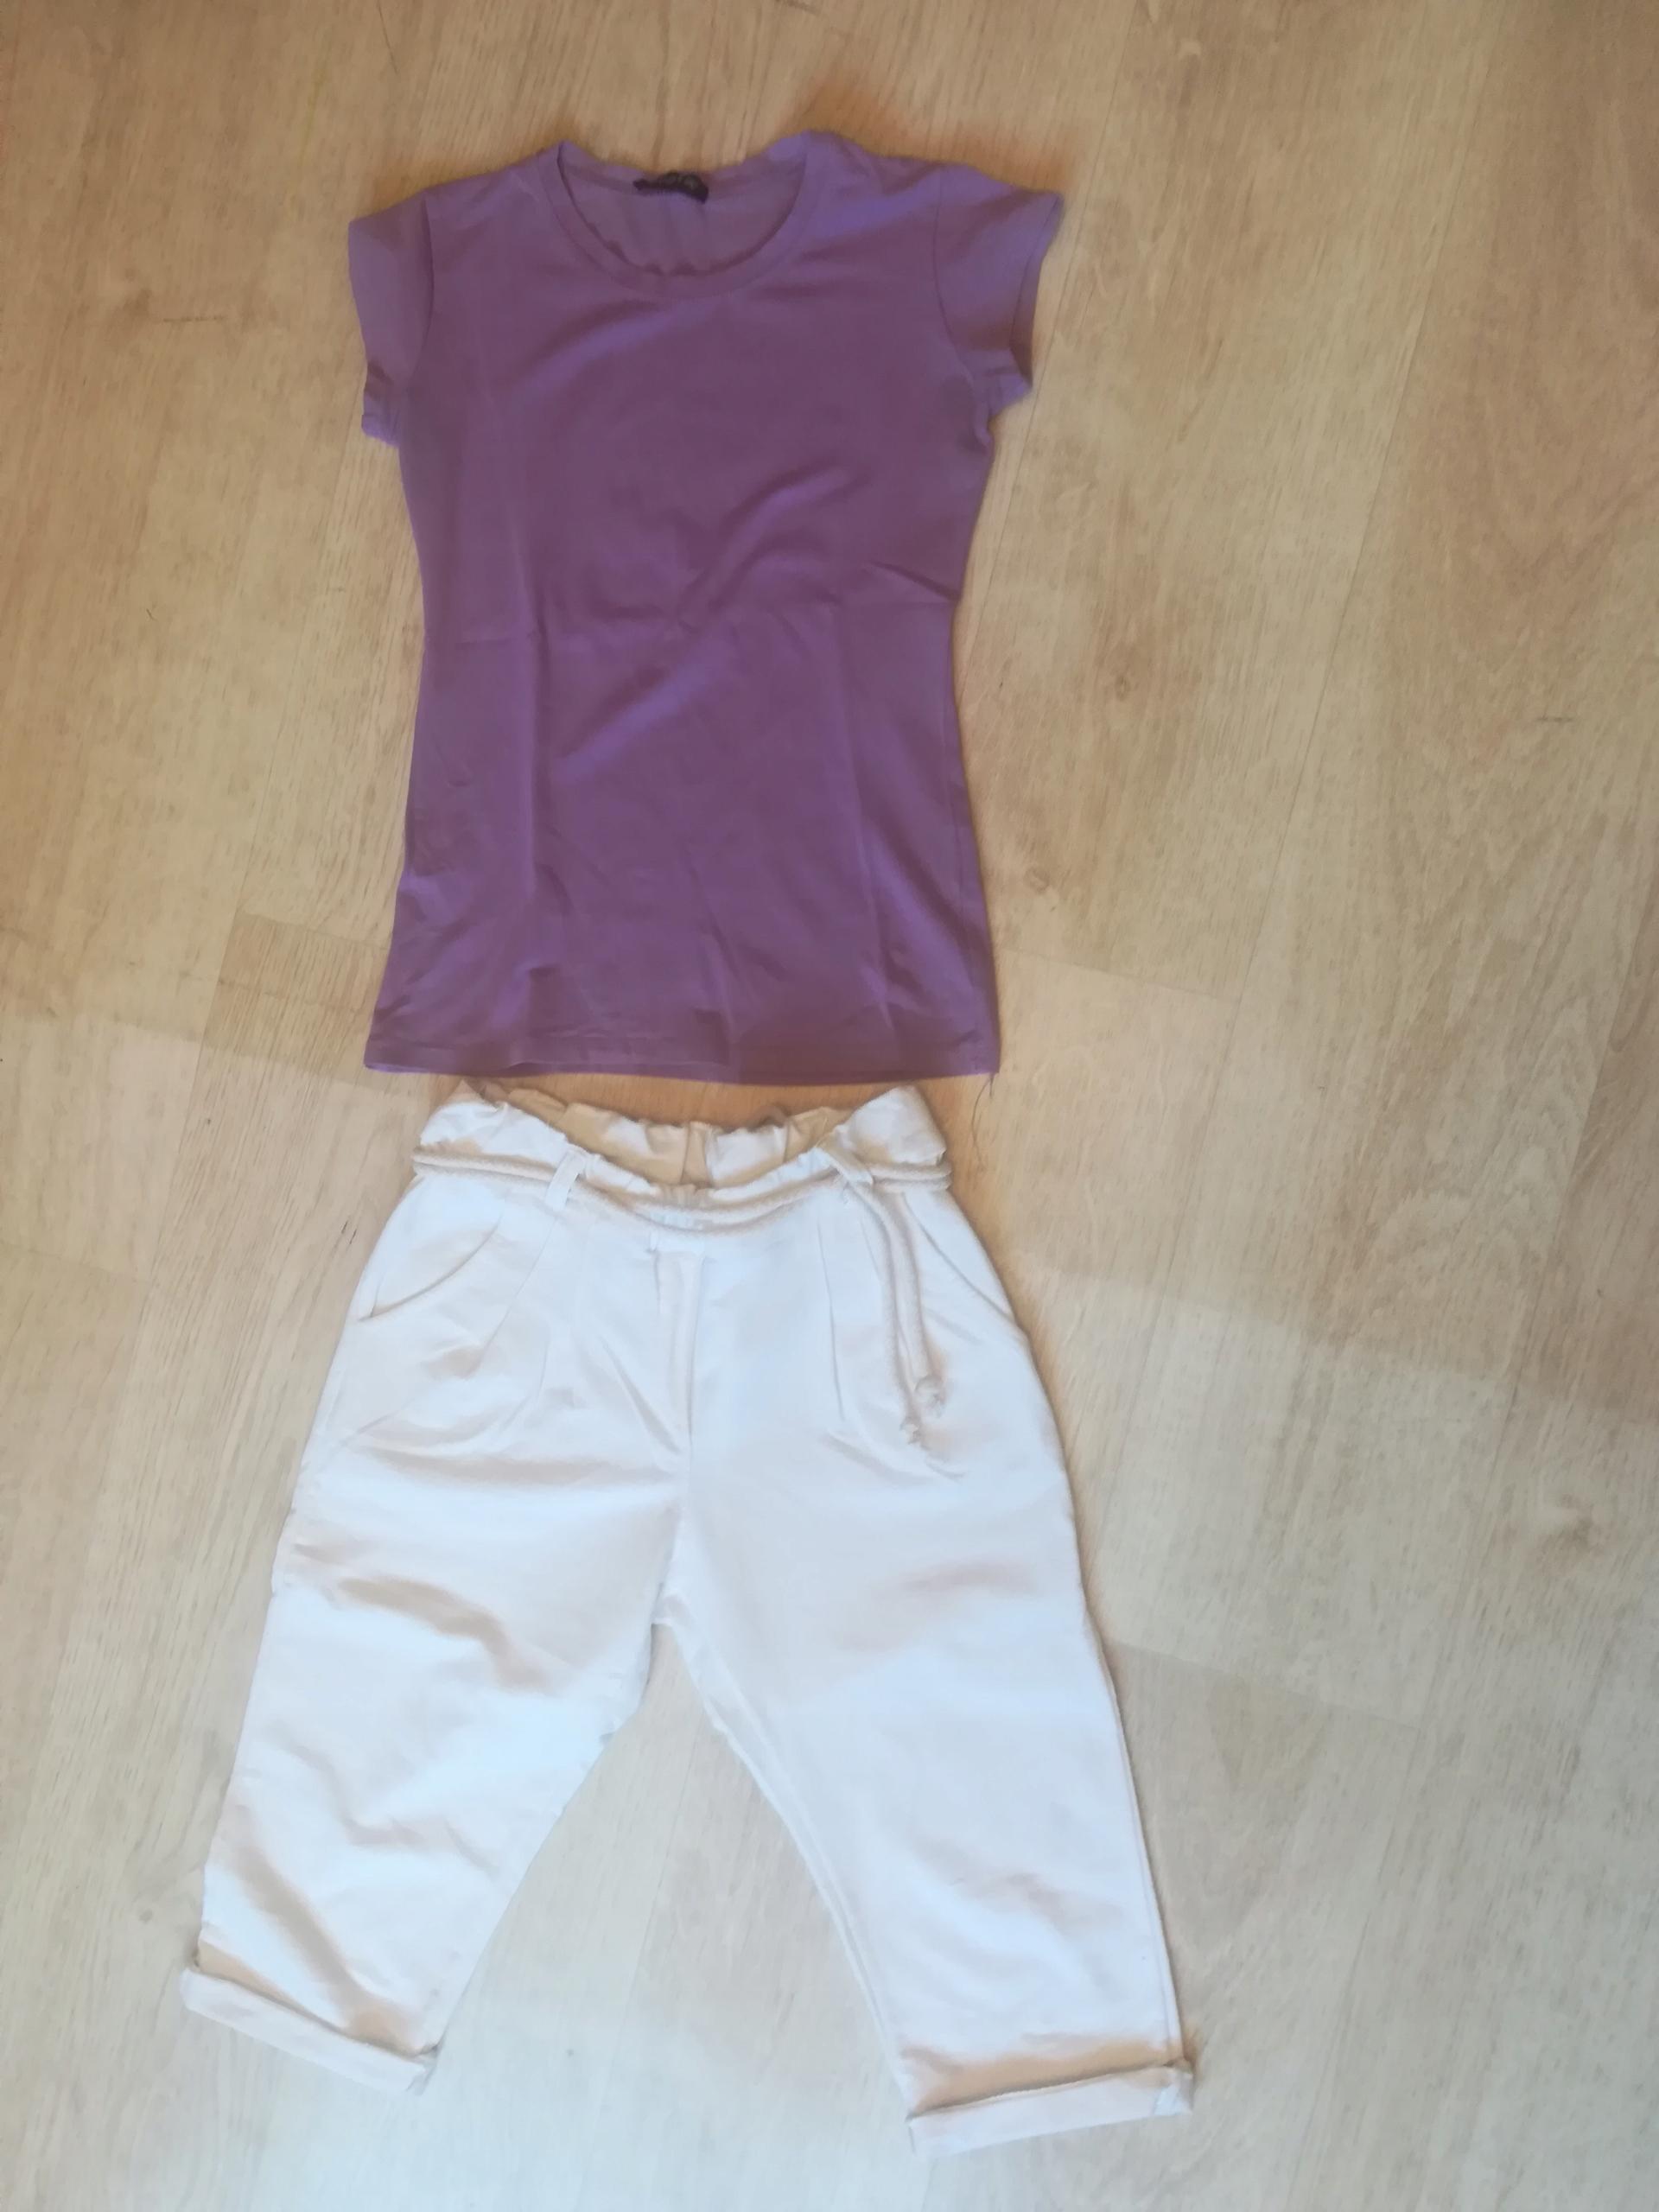 Komplet spodenki plus koszulka damska S